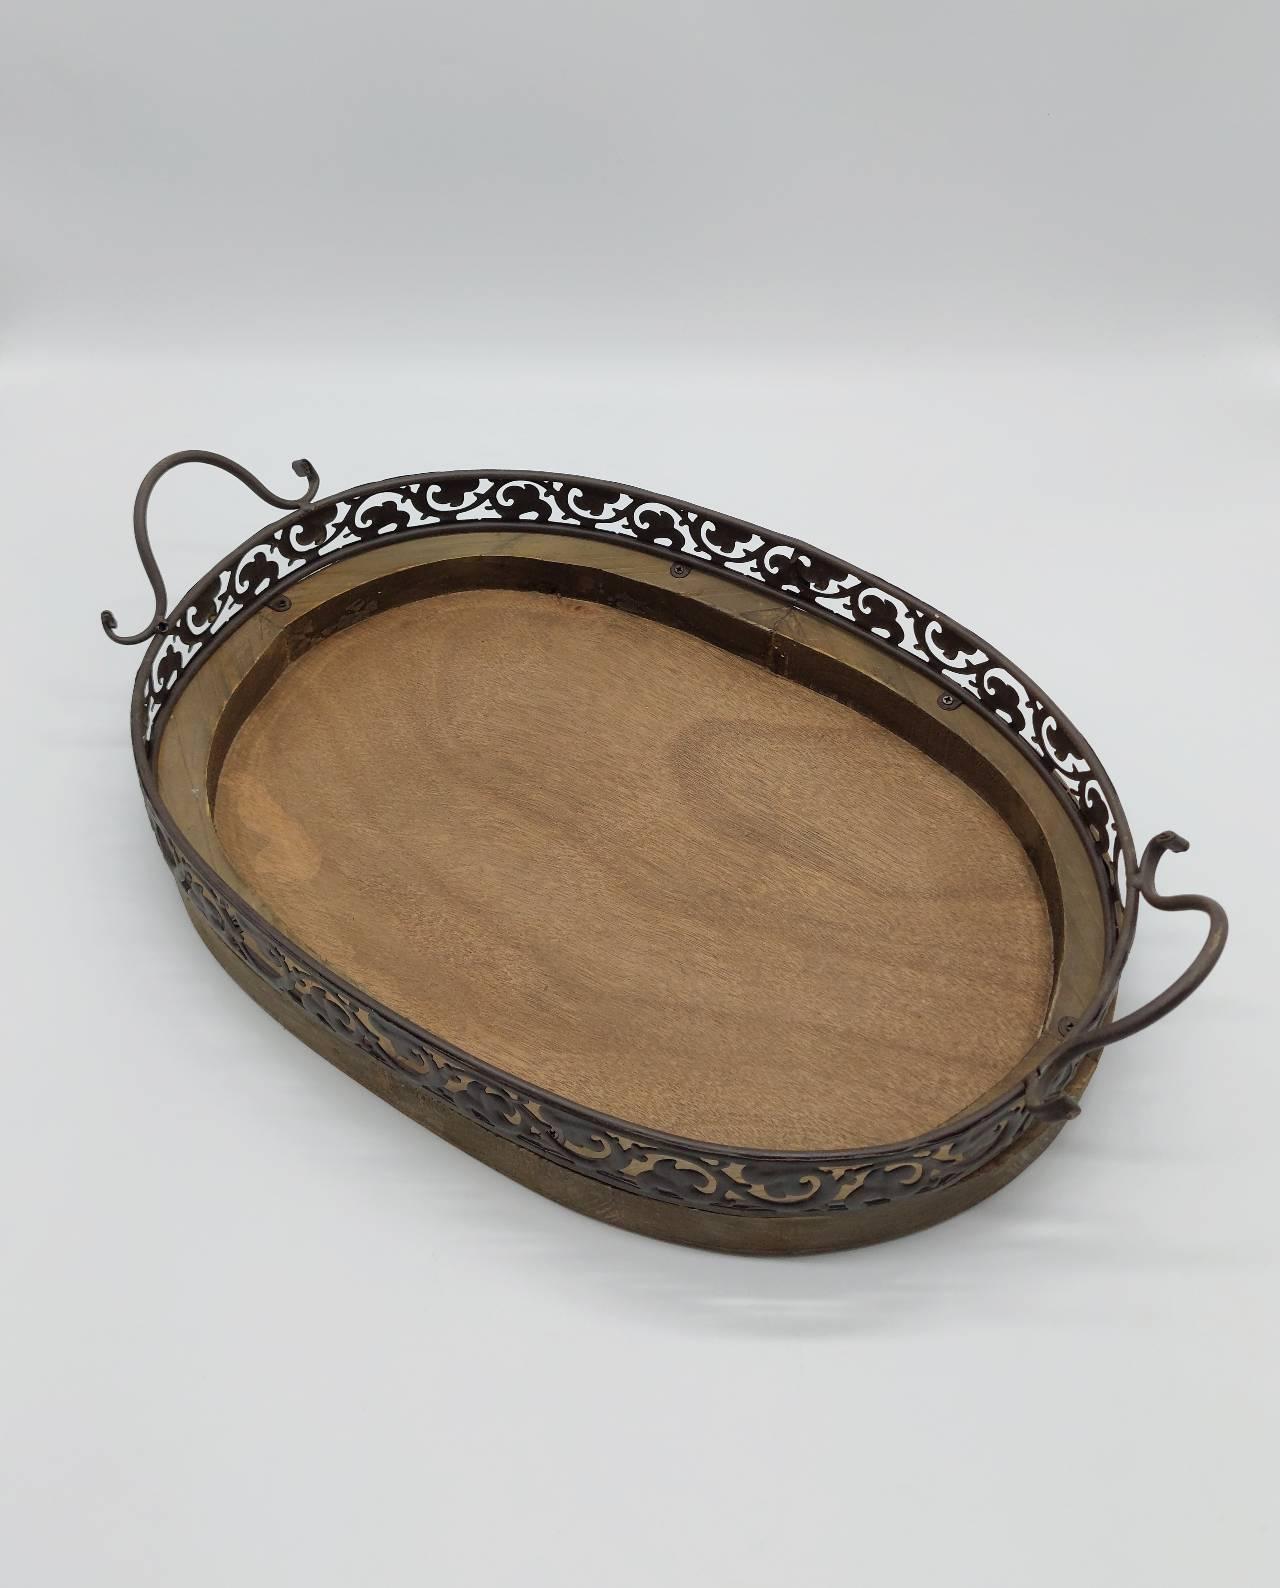 Tray Brown Wooden Metal 45 cm x 33 cm